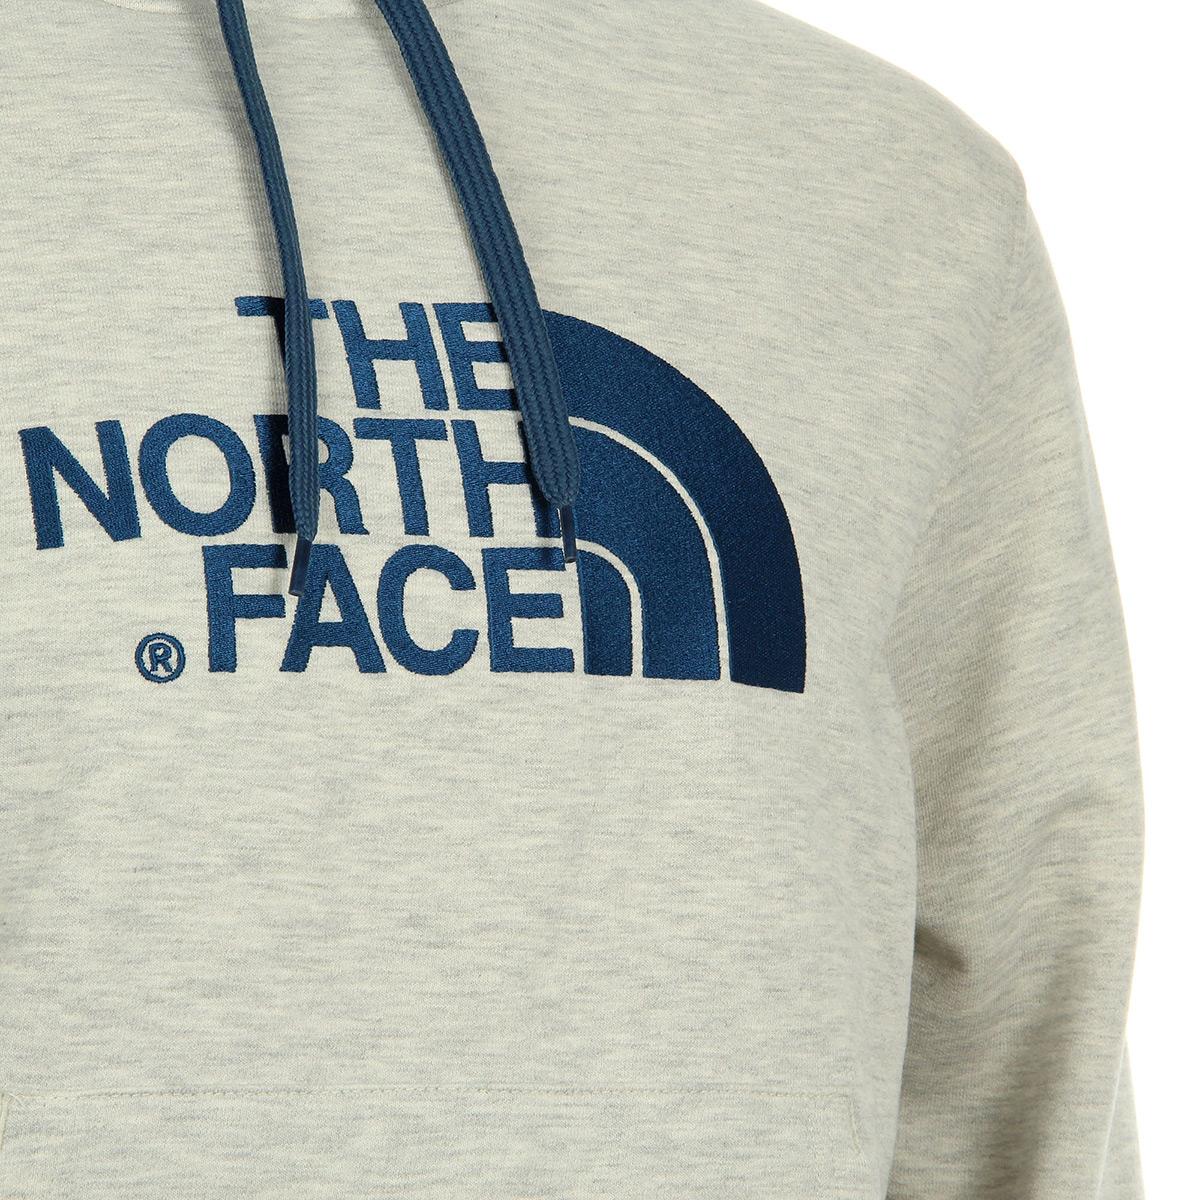 The North Face Drew Peak Po Hd T0A0TECEJ, Sweats homme